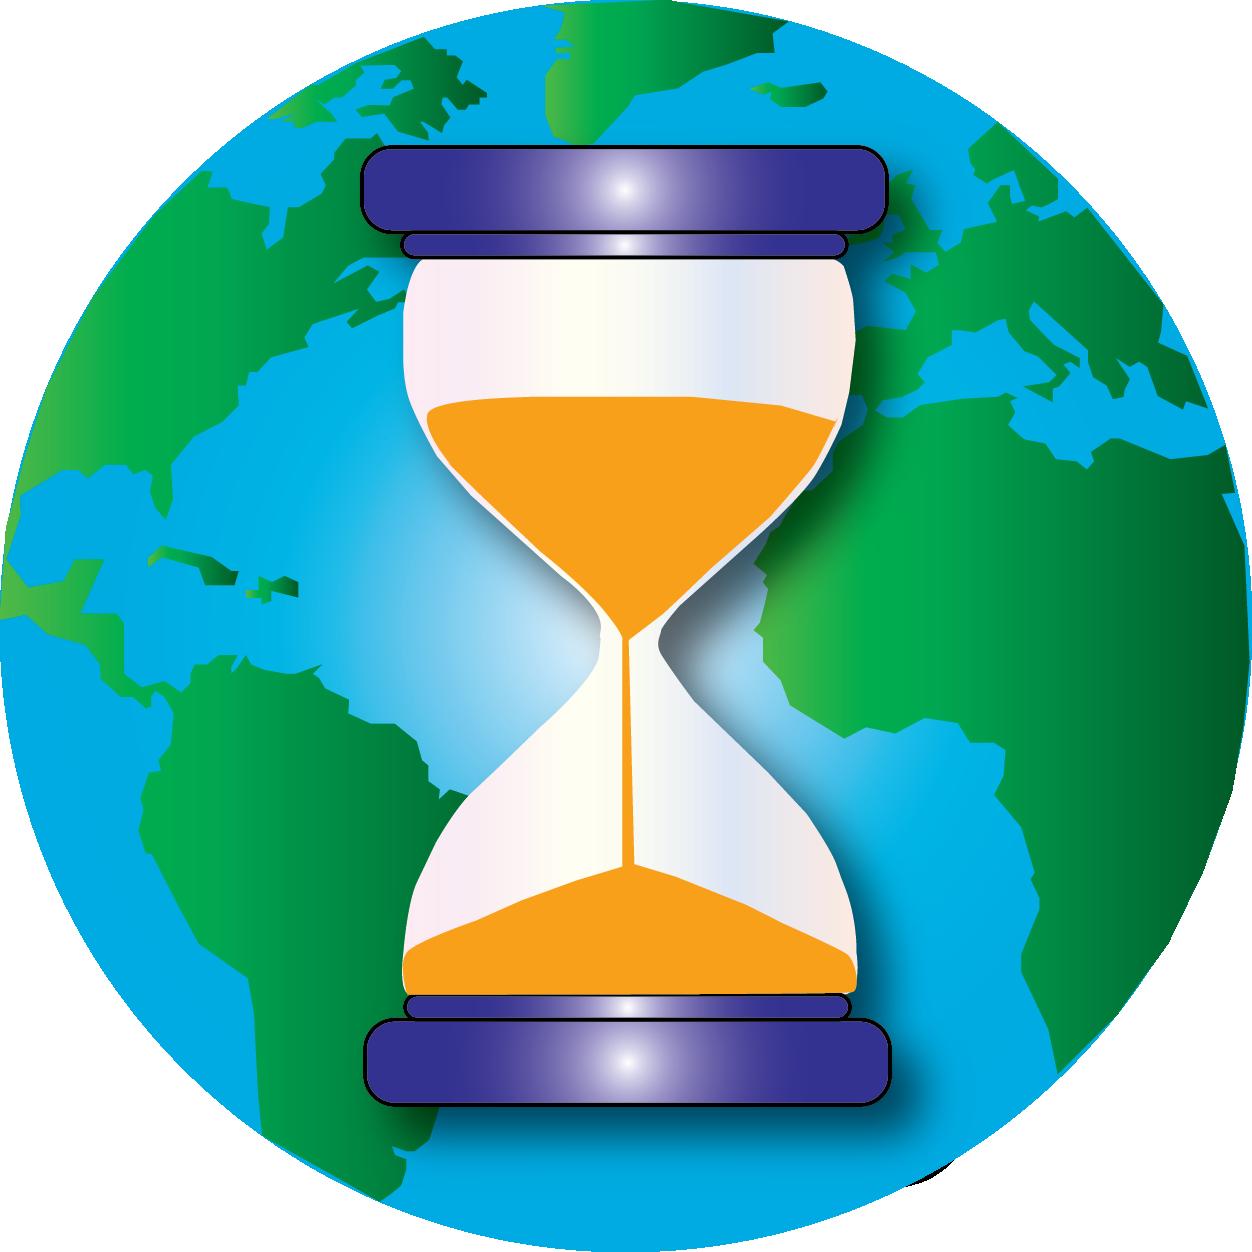 Hourglass clipart broken. Radionuclide basics tritium radiation